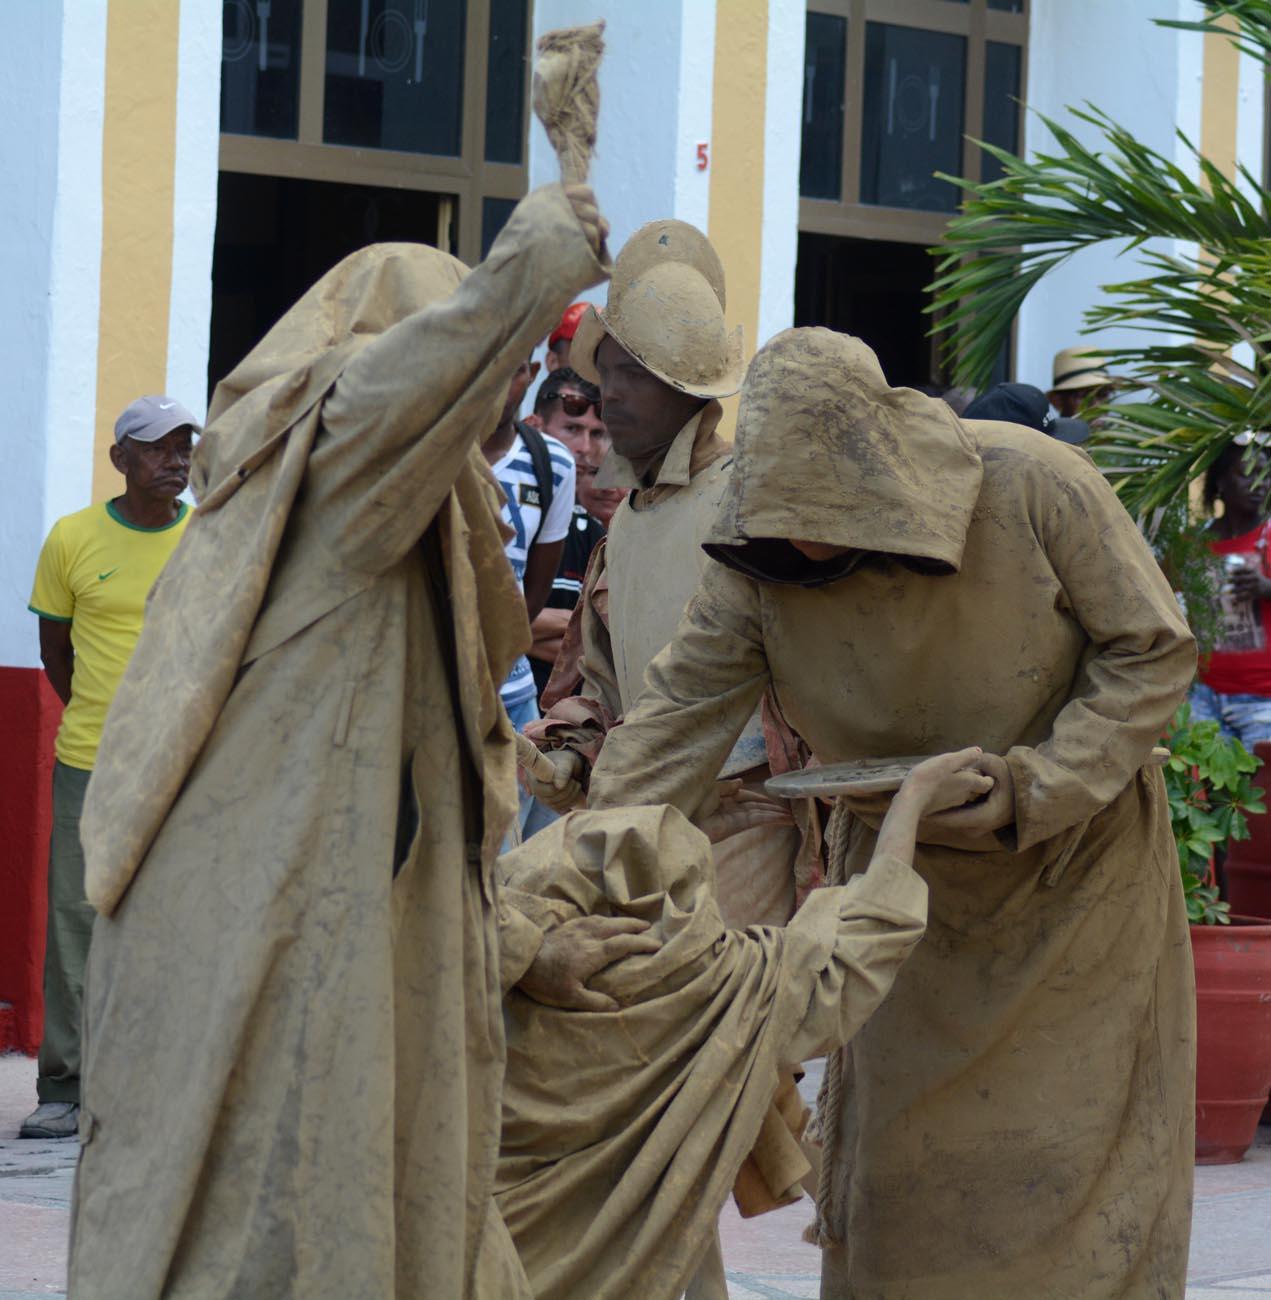 teatro, Trinidad, Sancti Spíritus, aniversario 503, 4 de junio